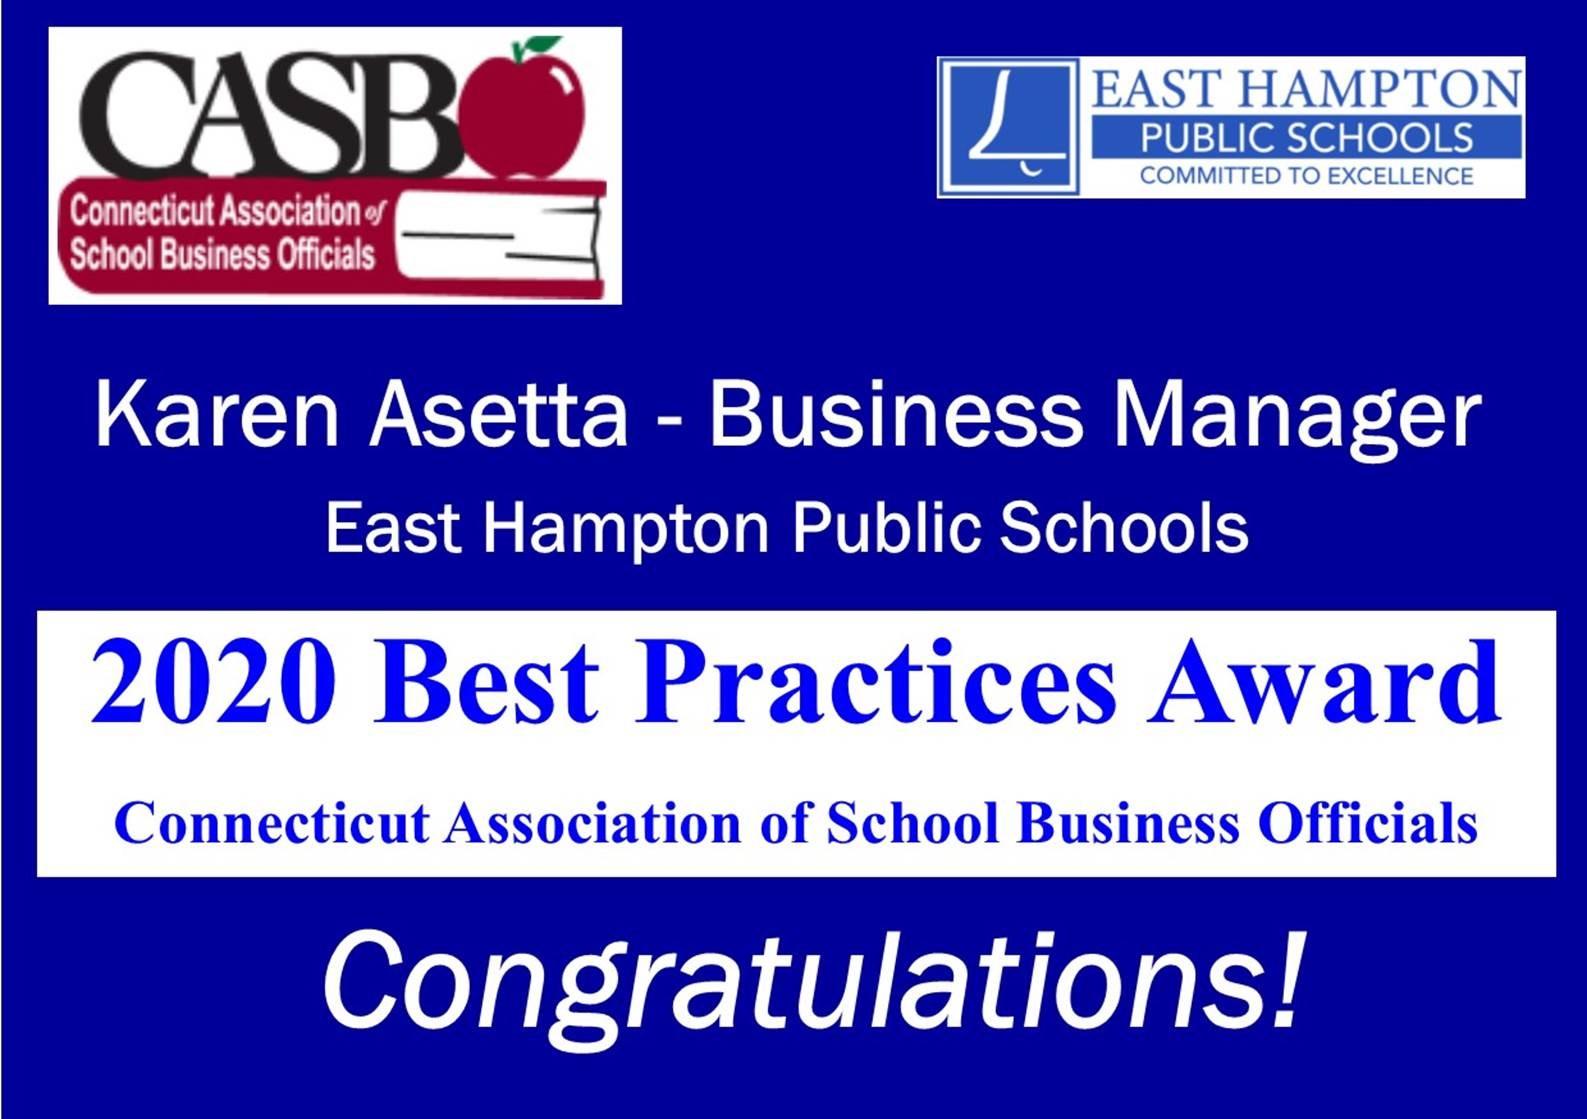 Karen Asetta - Business Manager East Hampton Public Schools